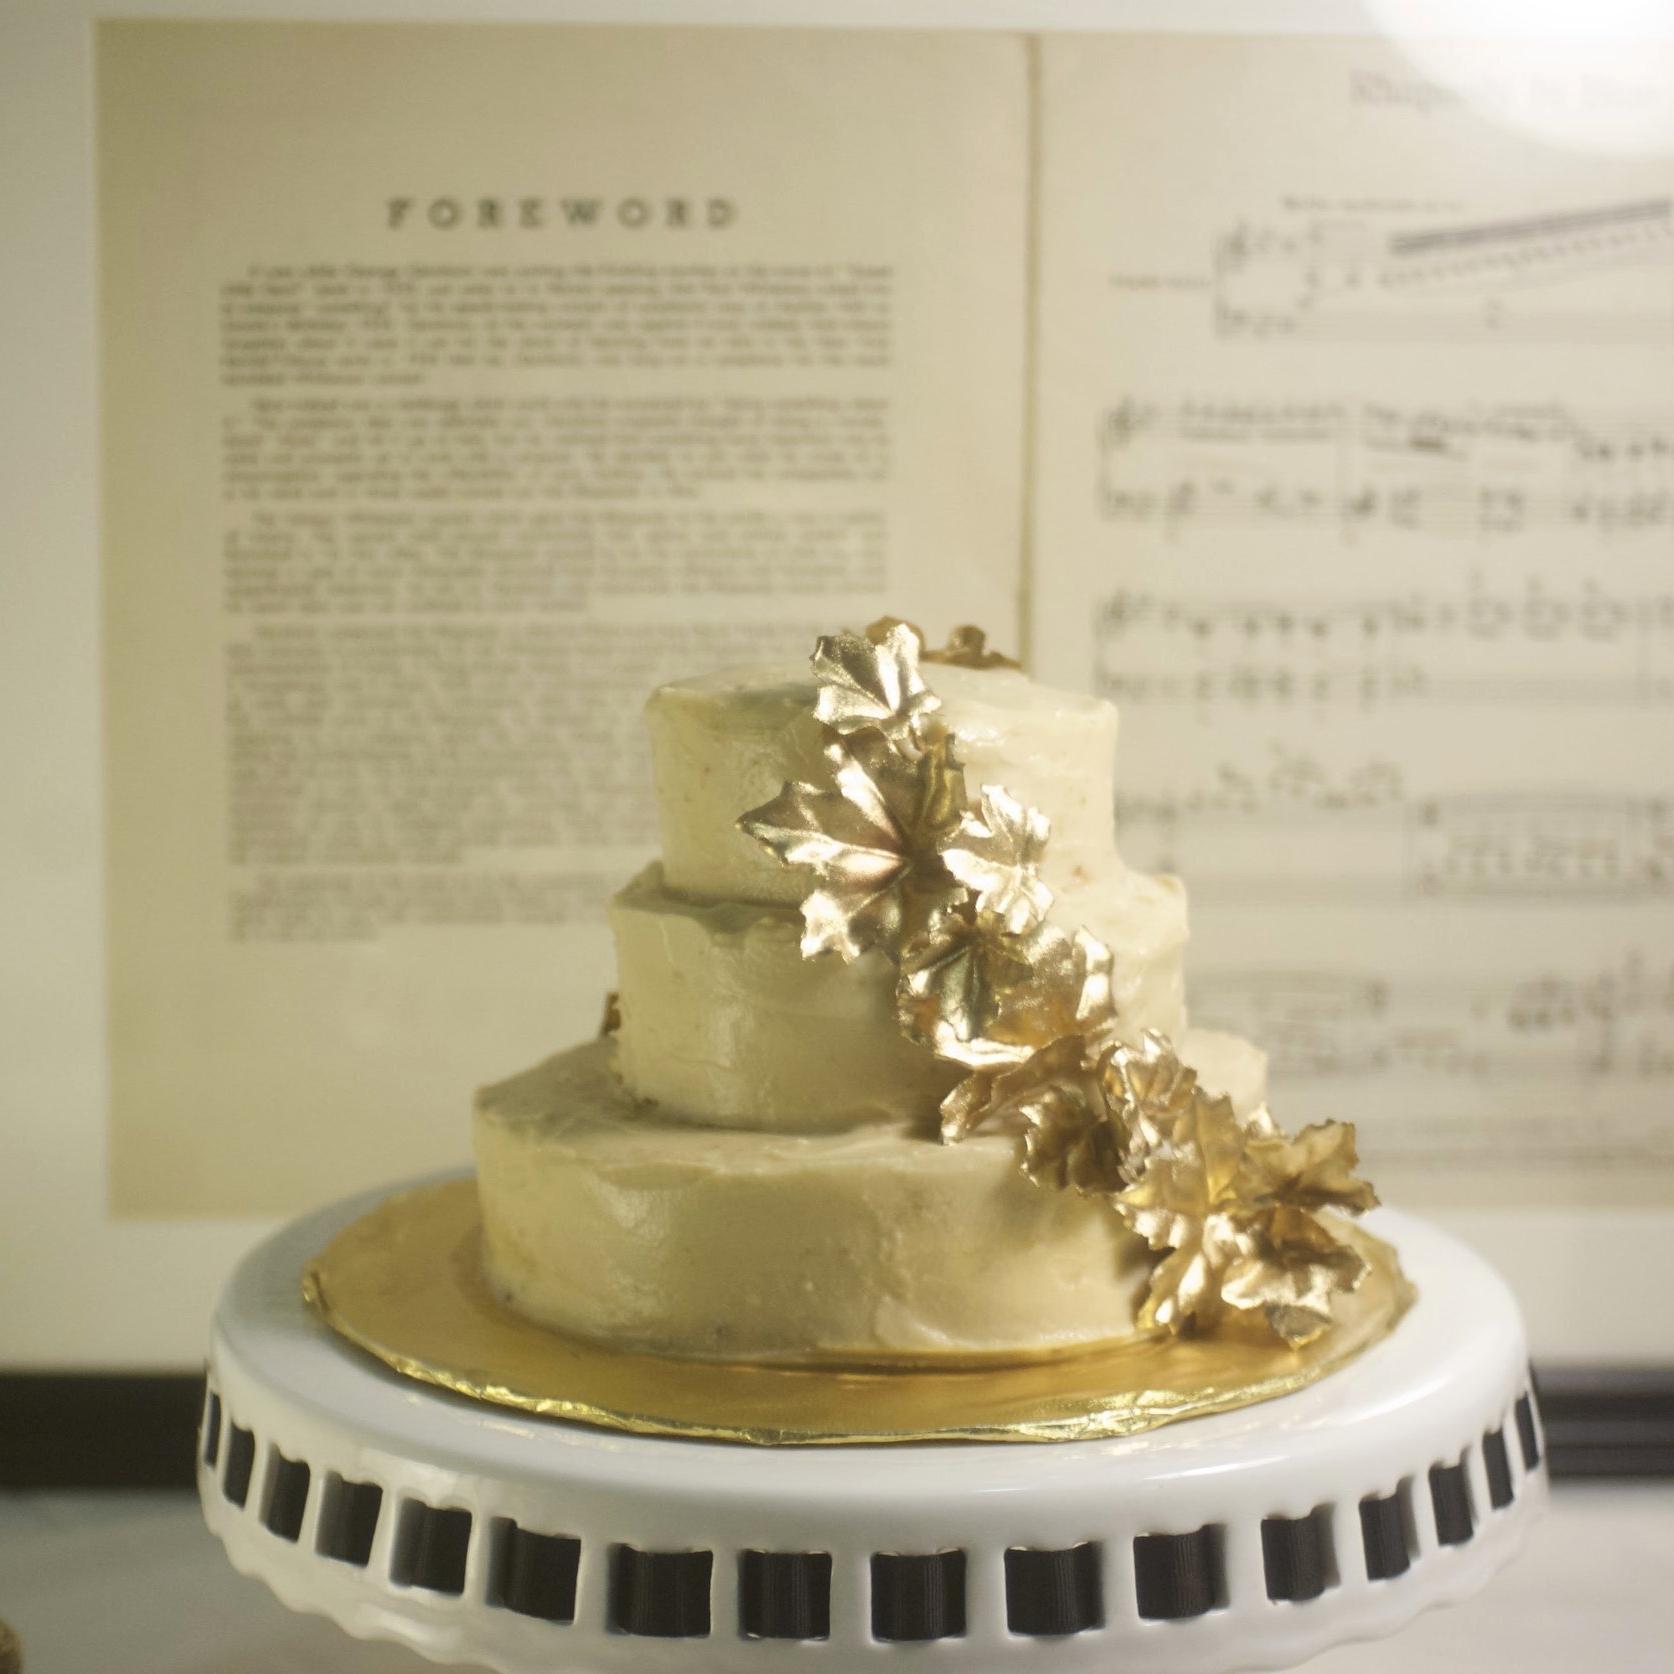 Fall maple cake